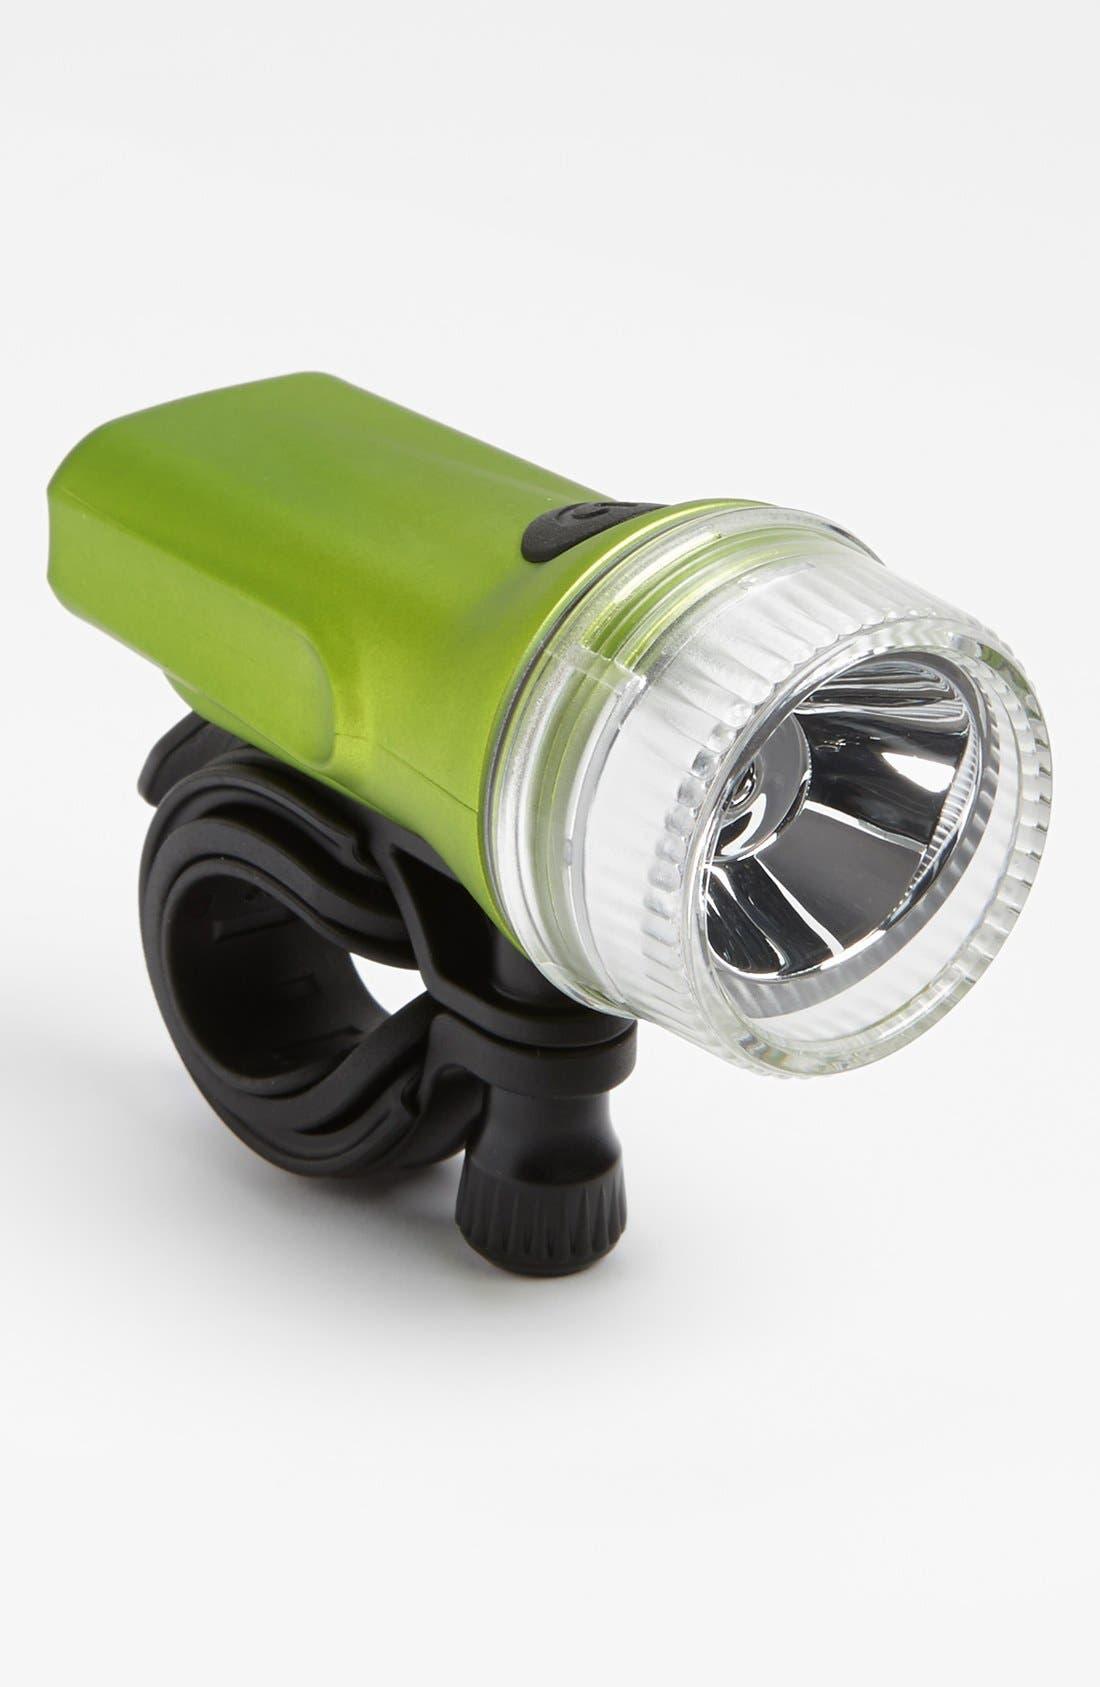 Main Image - Streamline LED Bike Light